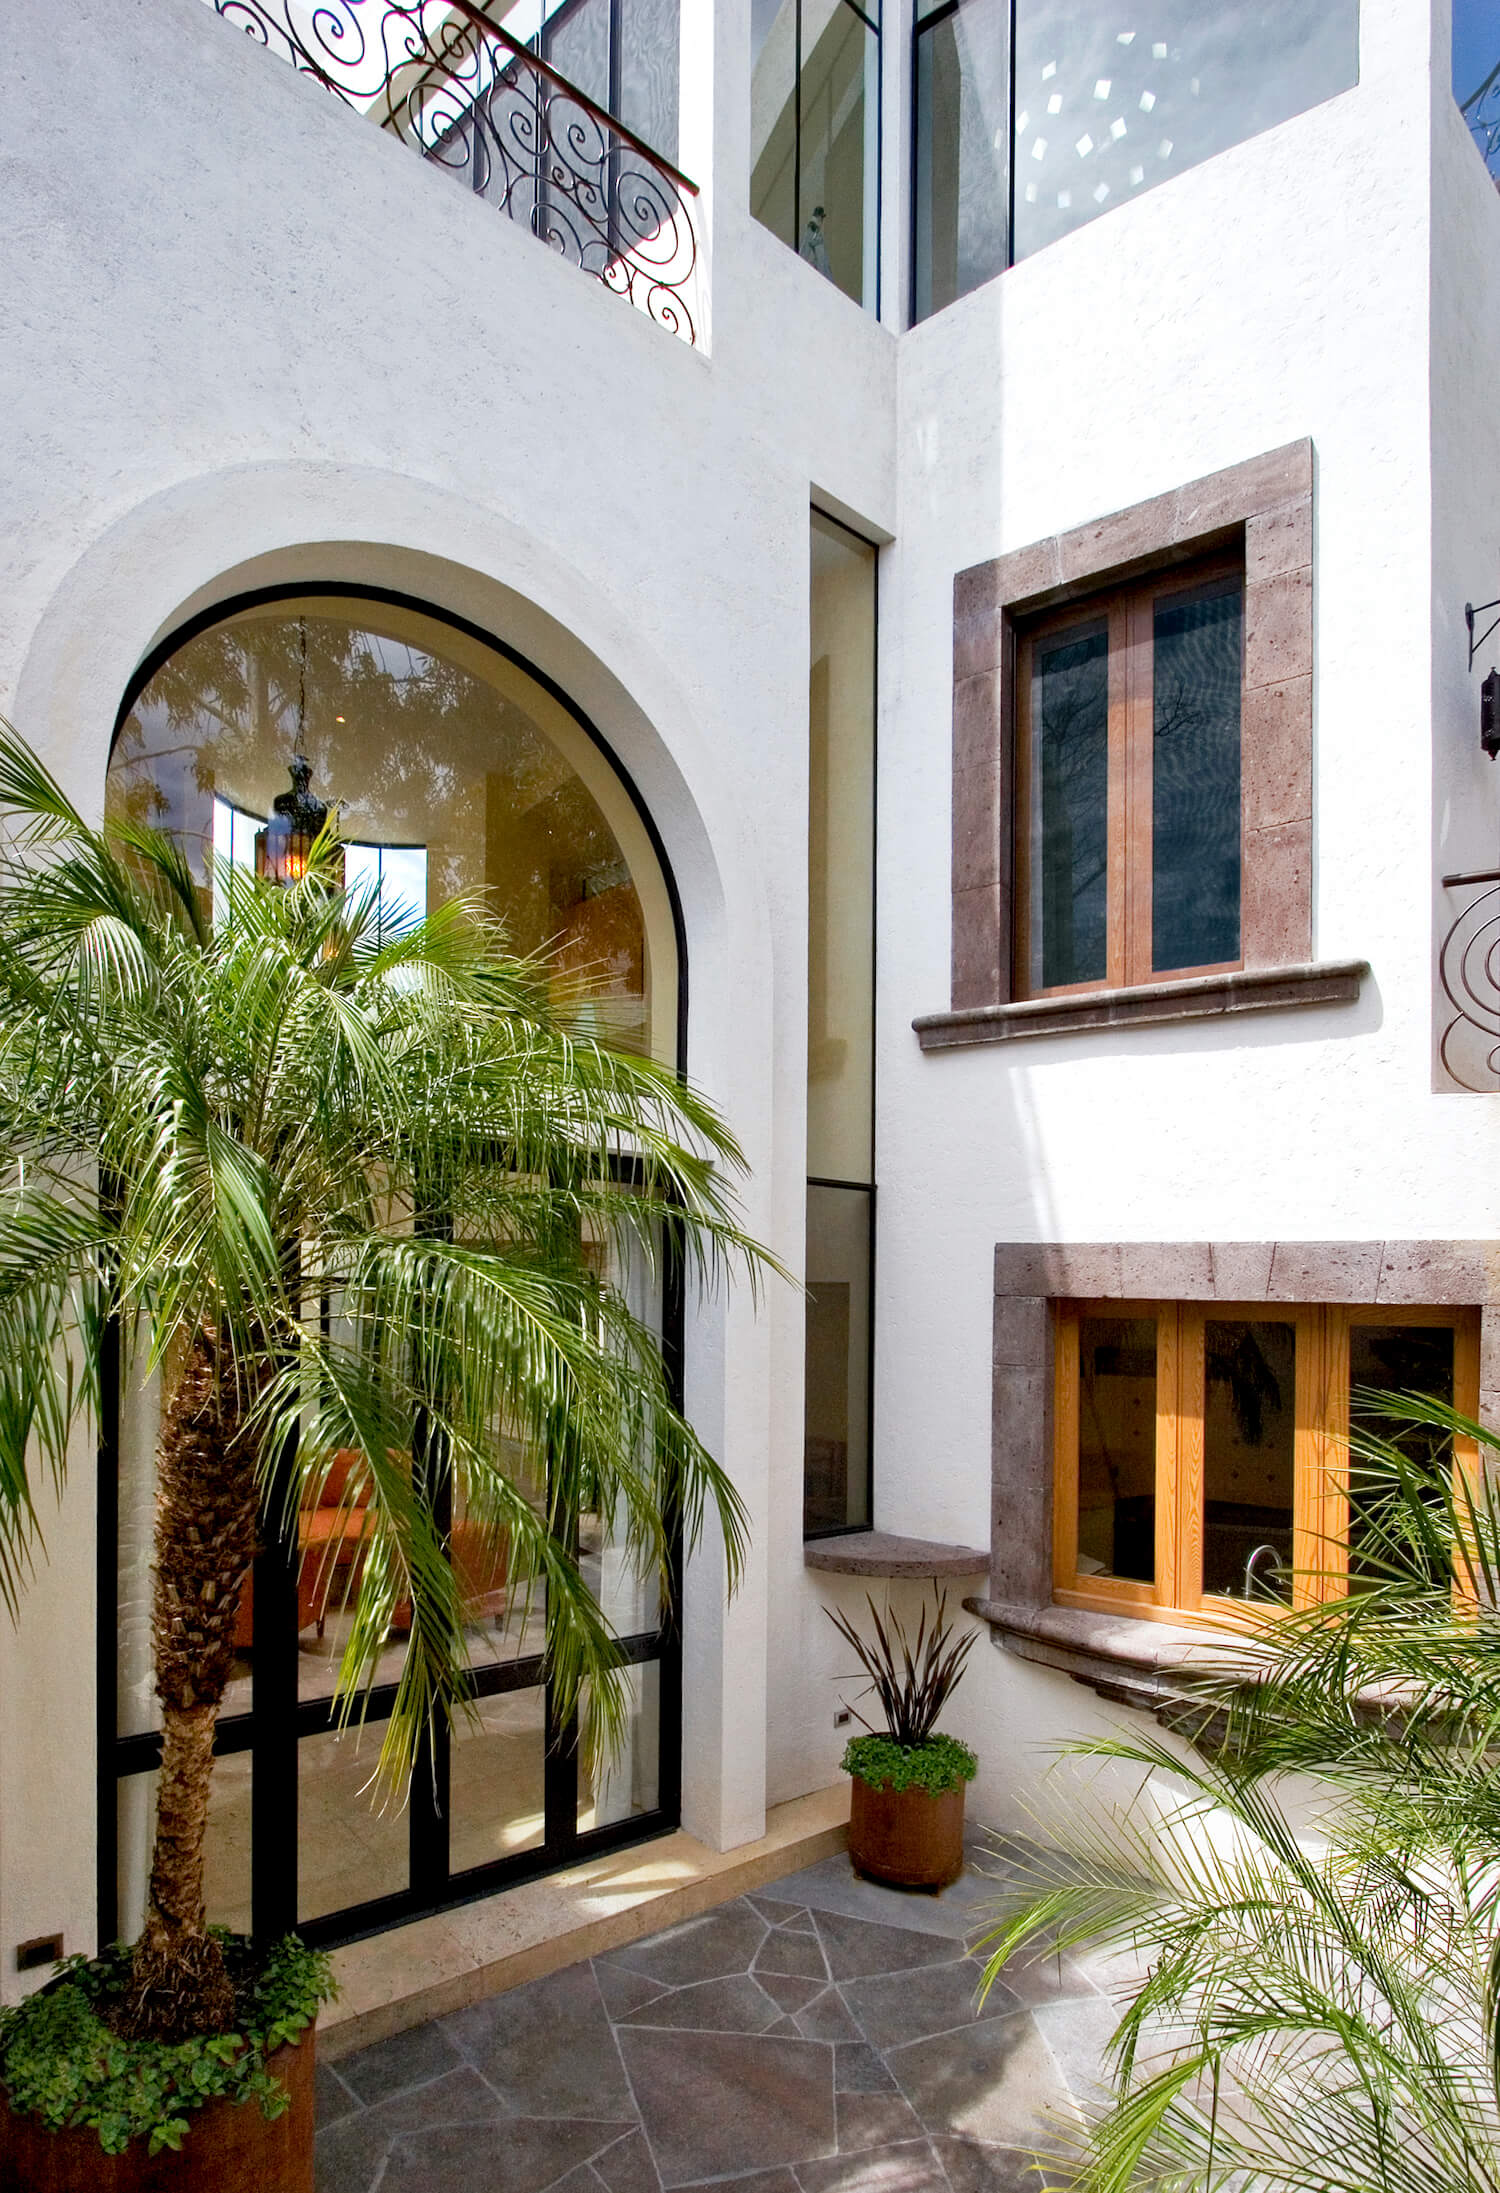 La entrada de la Casa Lluvia Blanca/Foto: House Architects